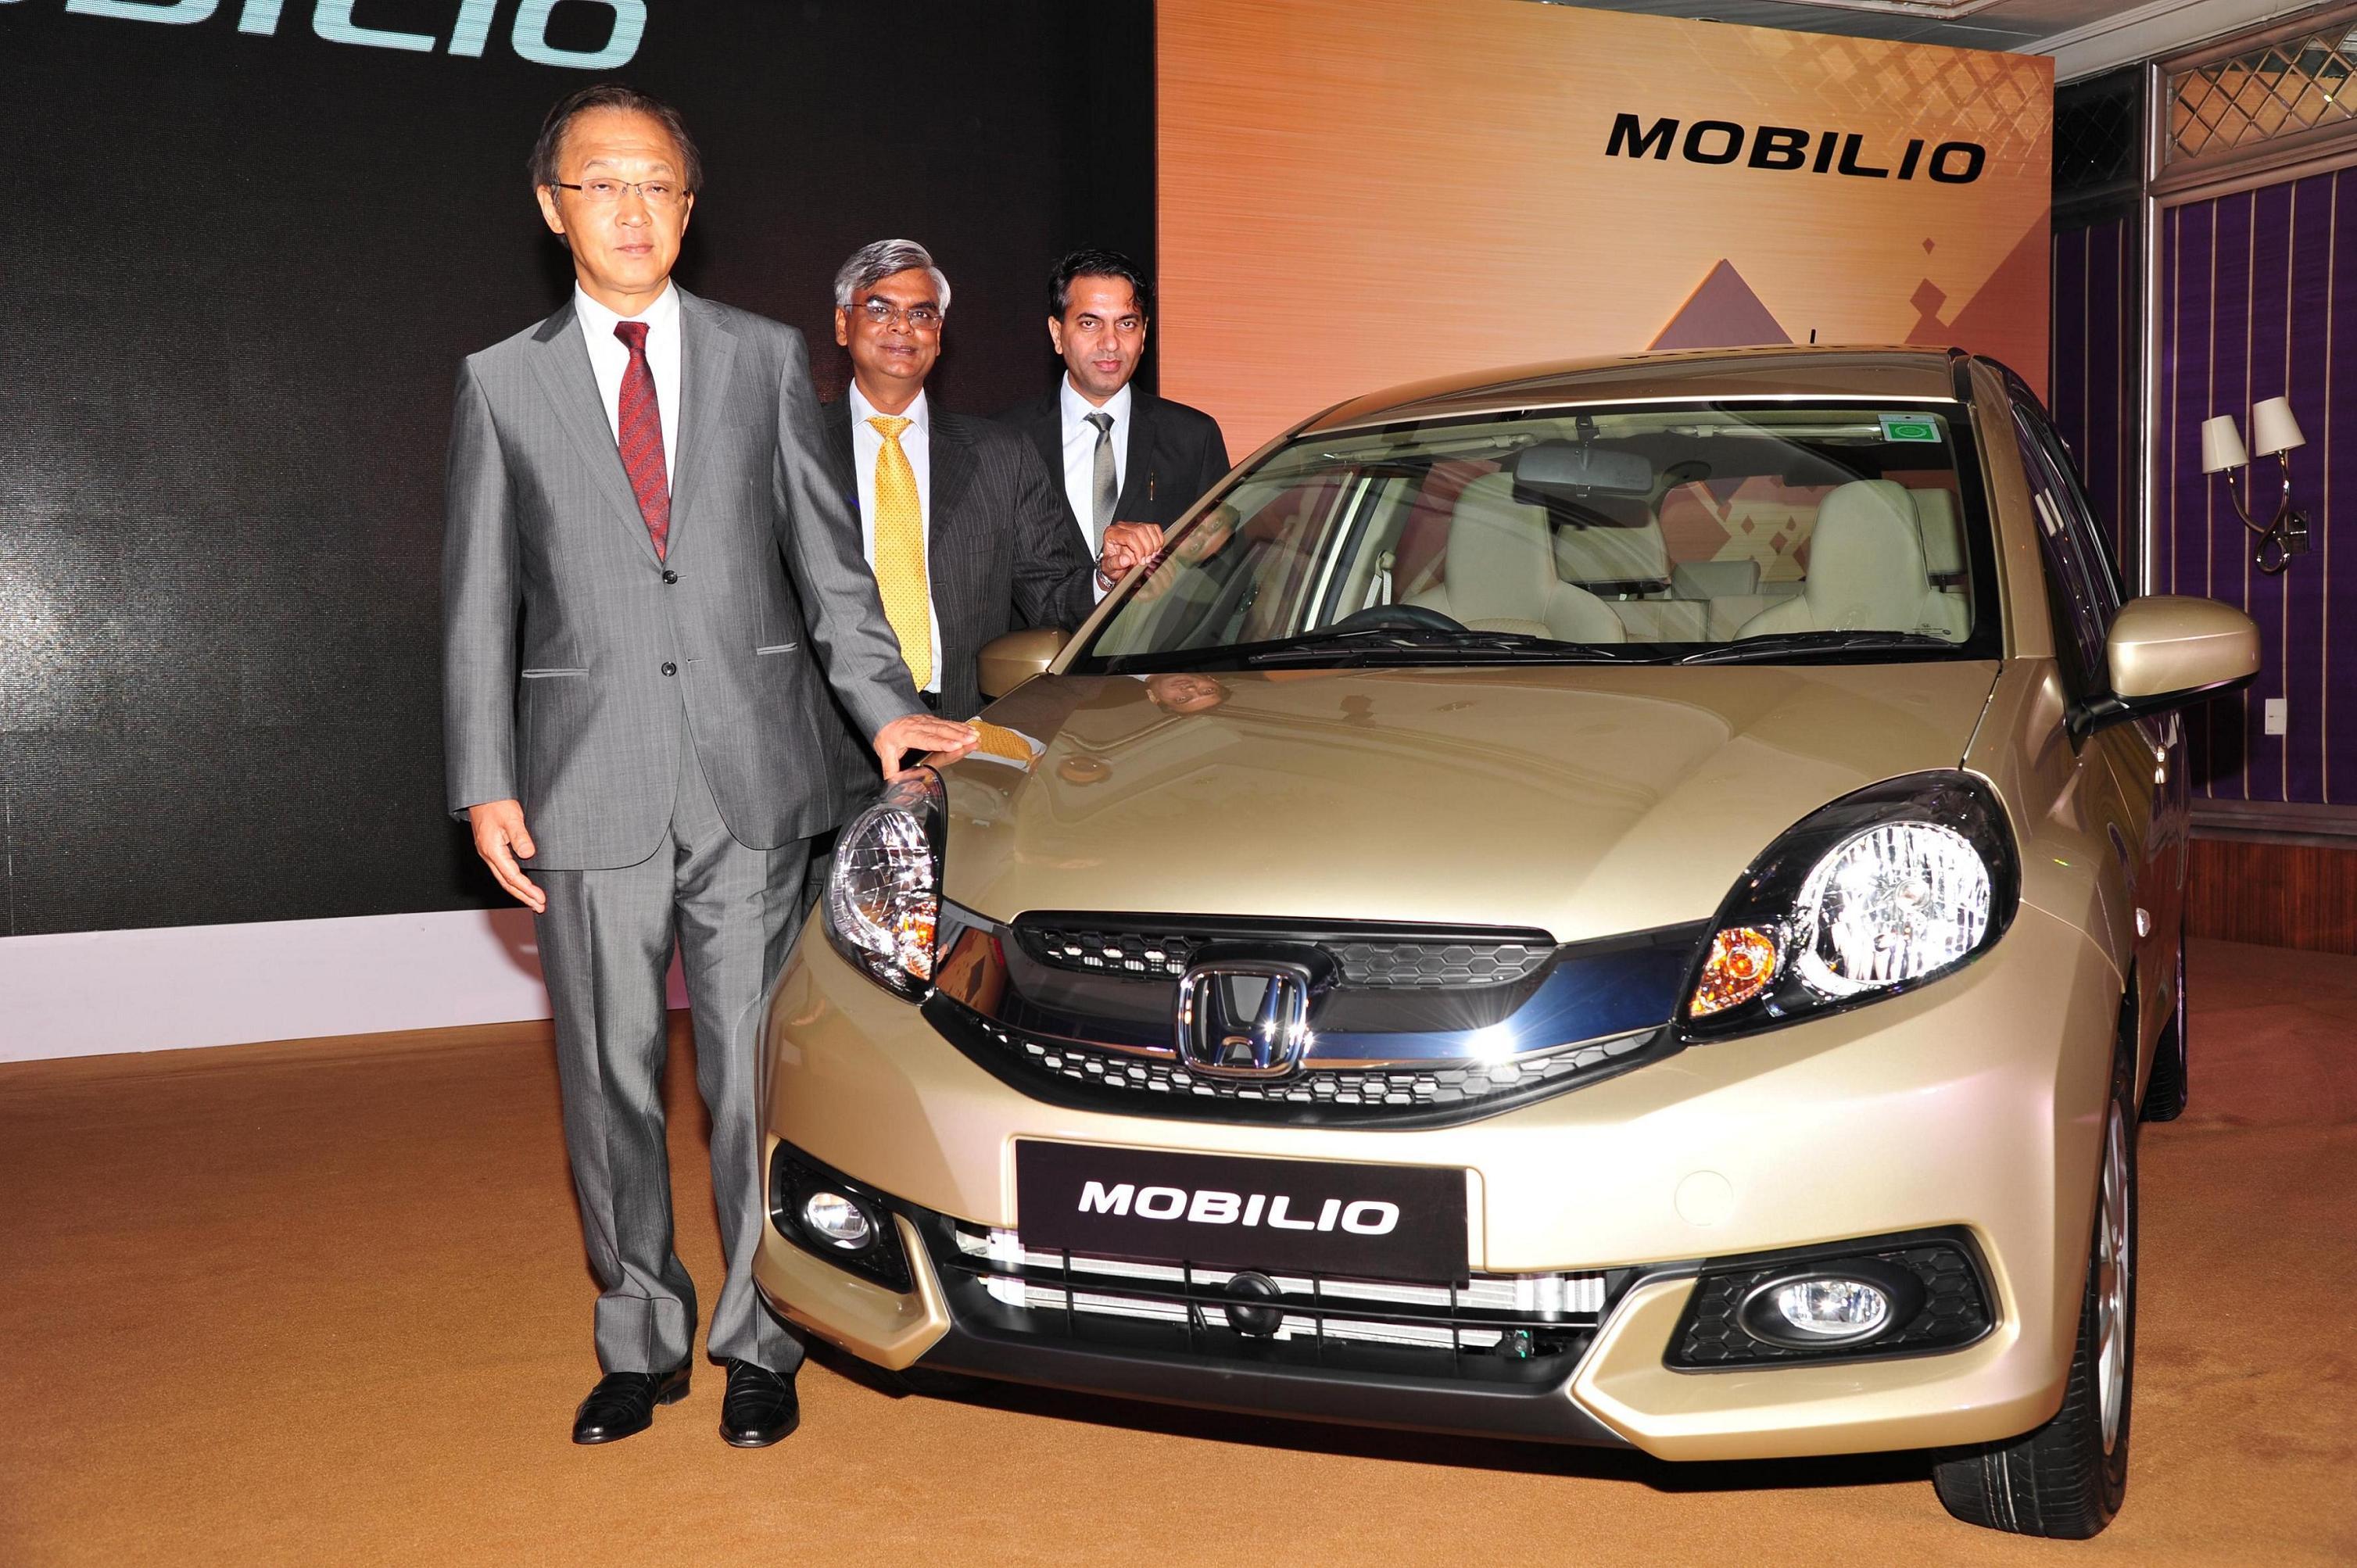 new car launches of 2014Honda Cars India launches midsize stylish 7seater MPV Honda